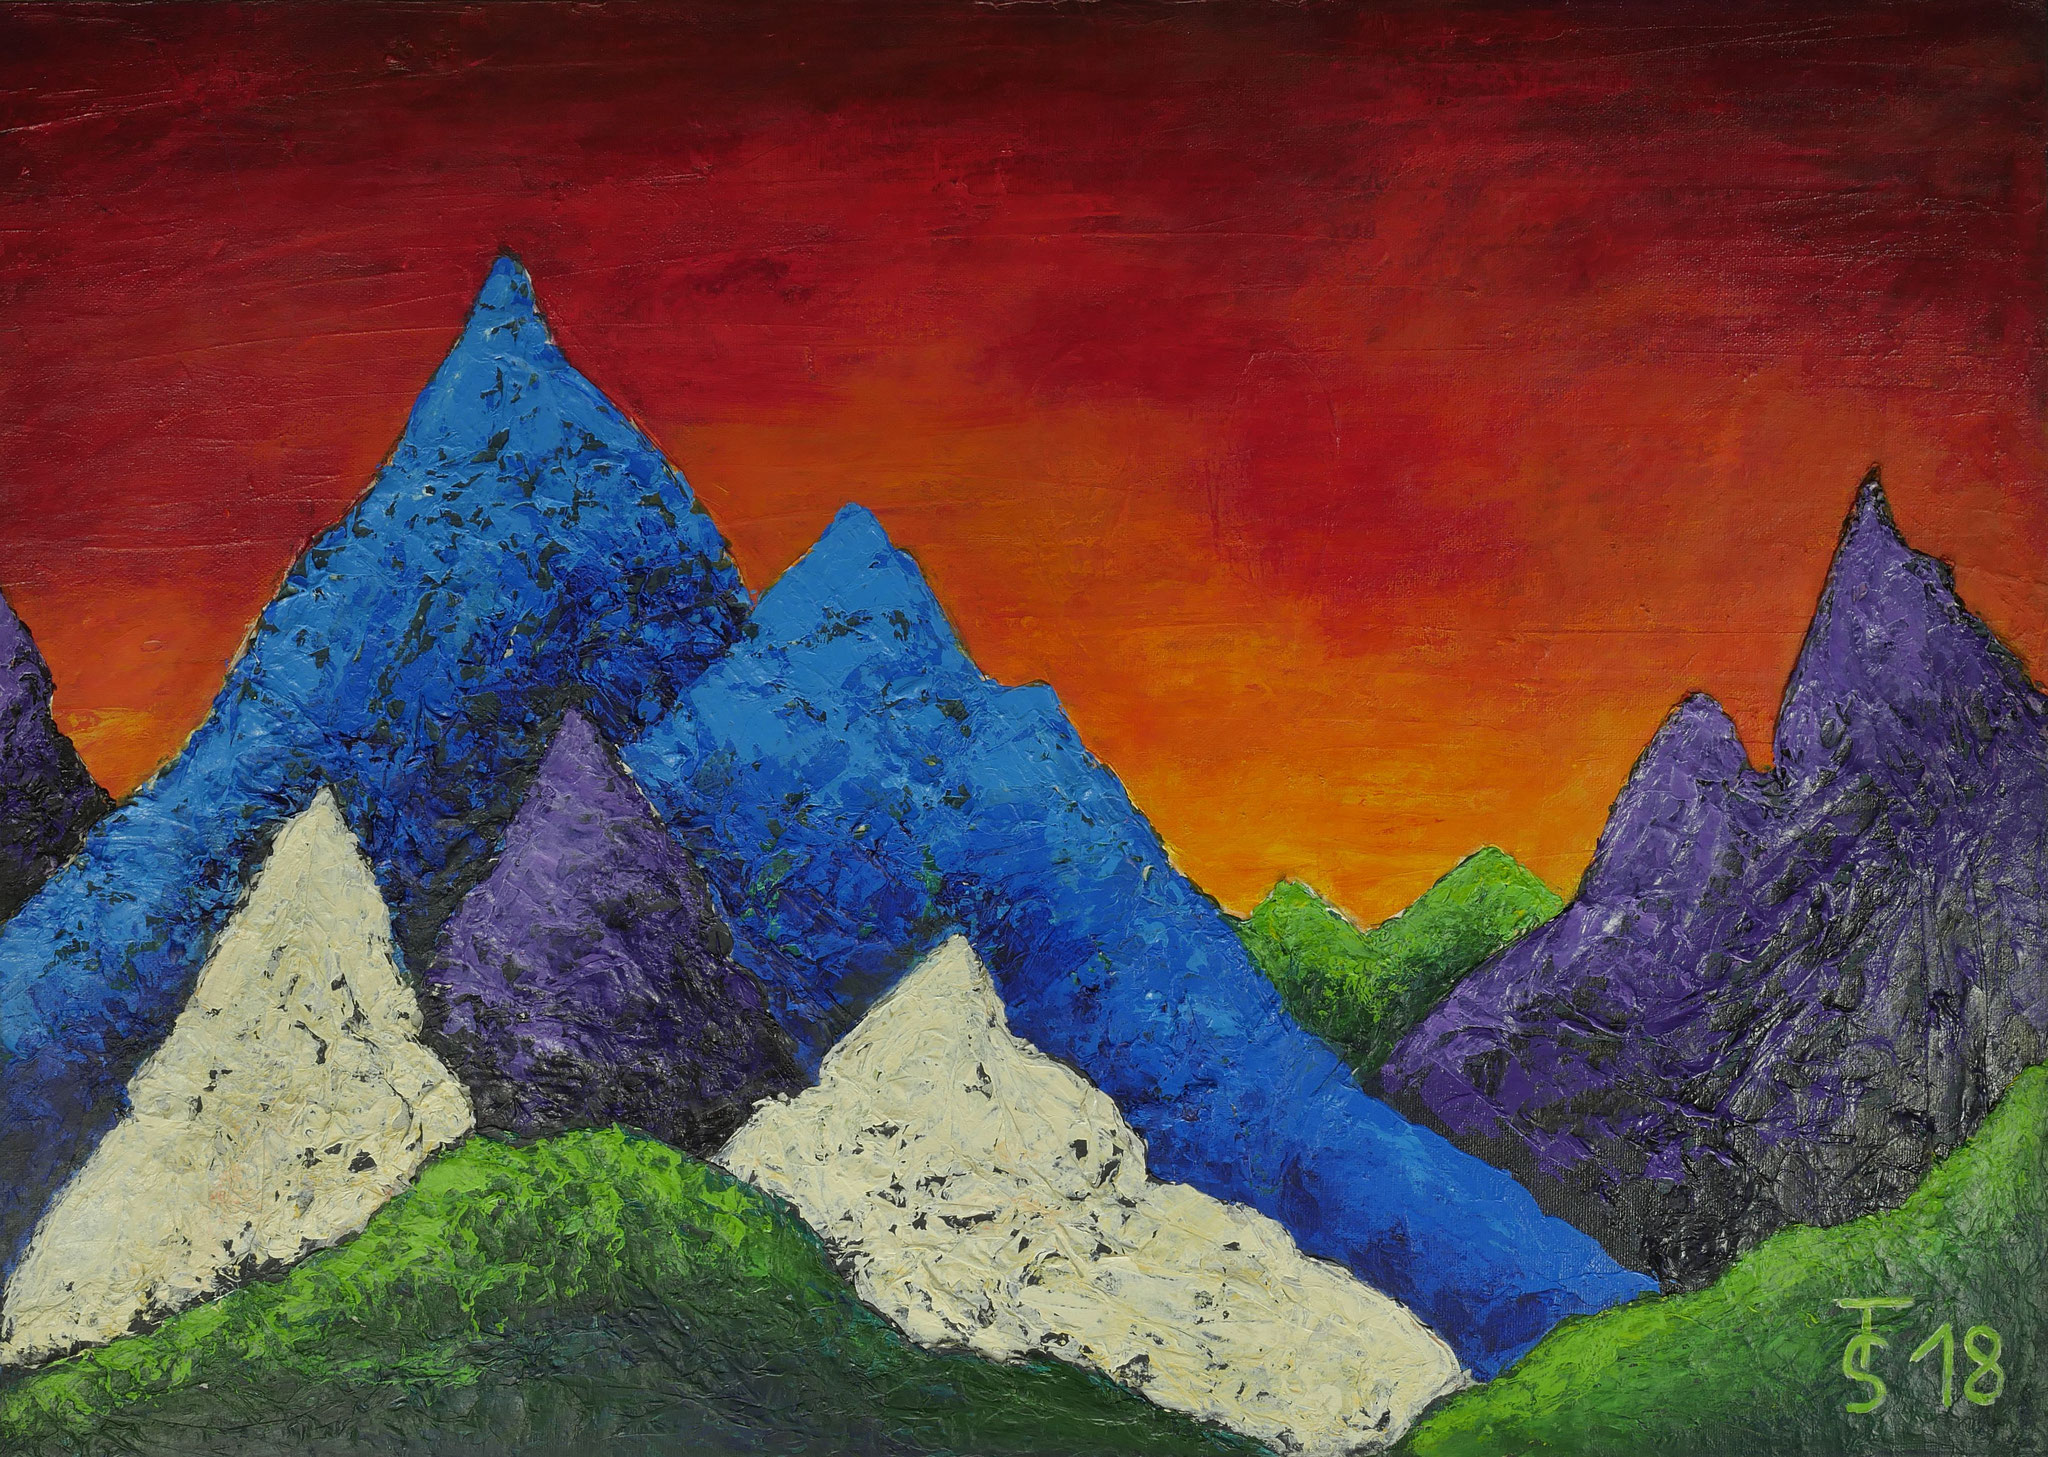 Berg-Magie  _  (Acryl auf Leinwand, 70 x 50 cm)